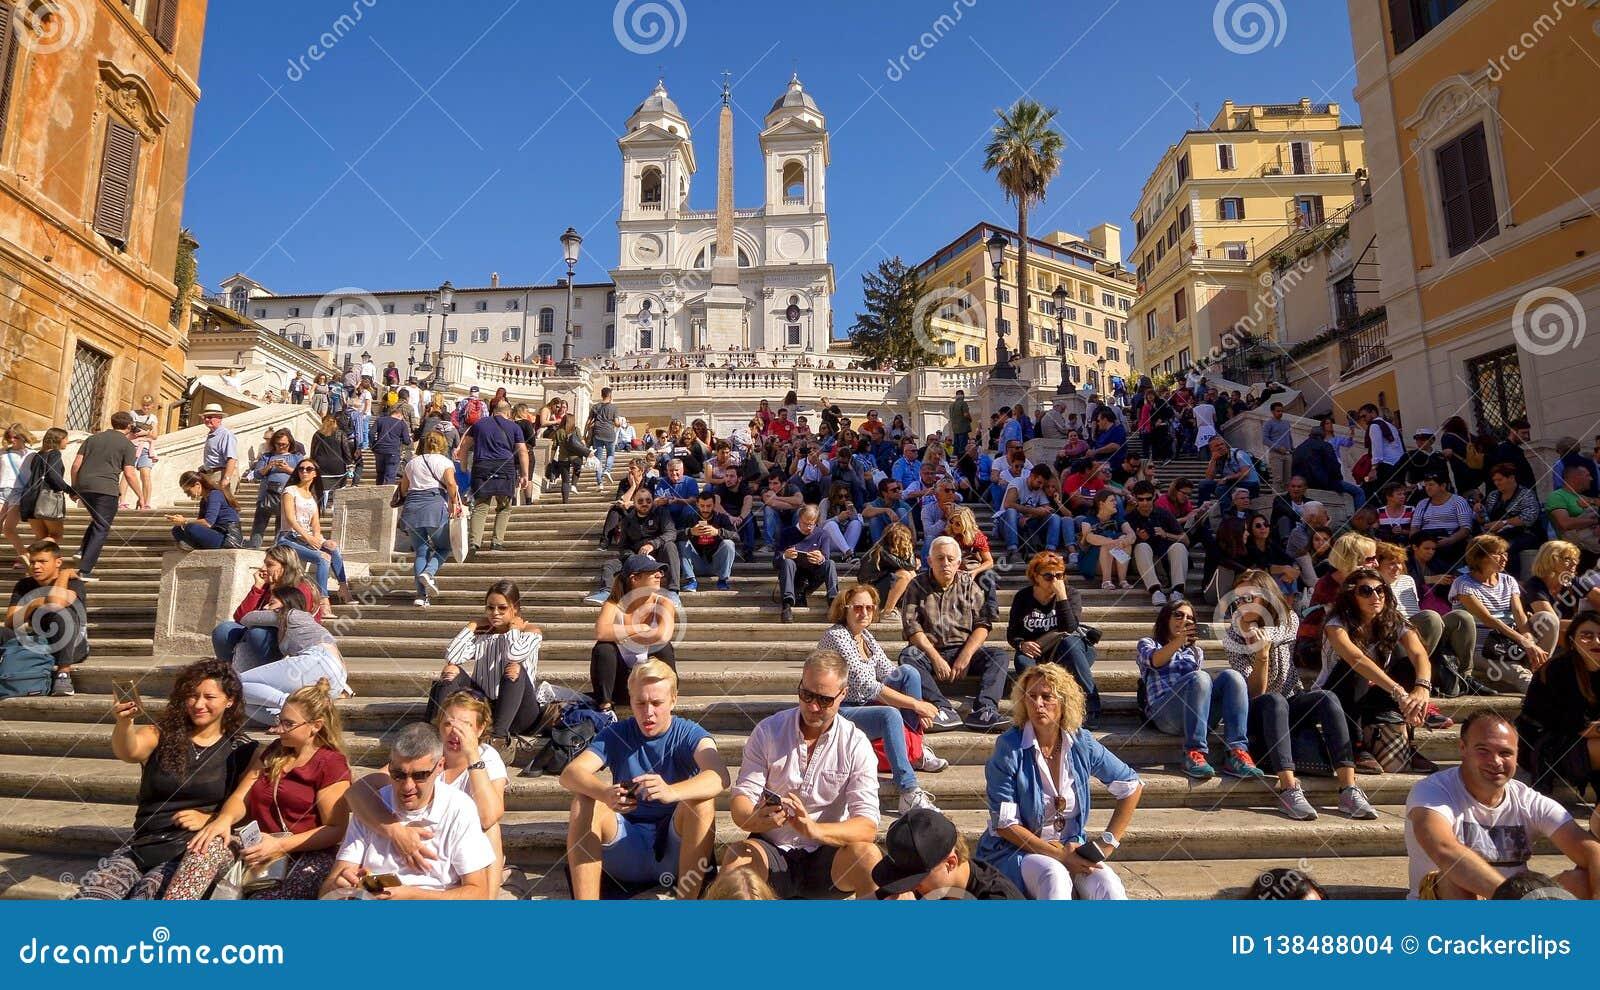 Punti spagnoli e turisti a Piazza di Spagna a Roma, Italia